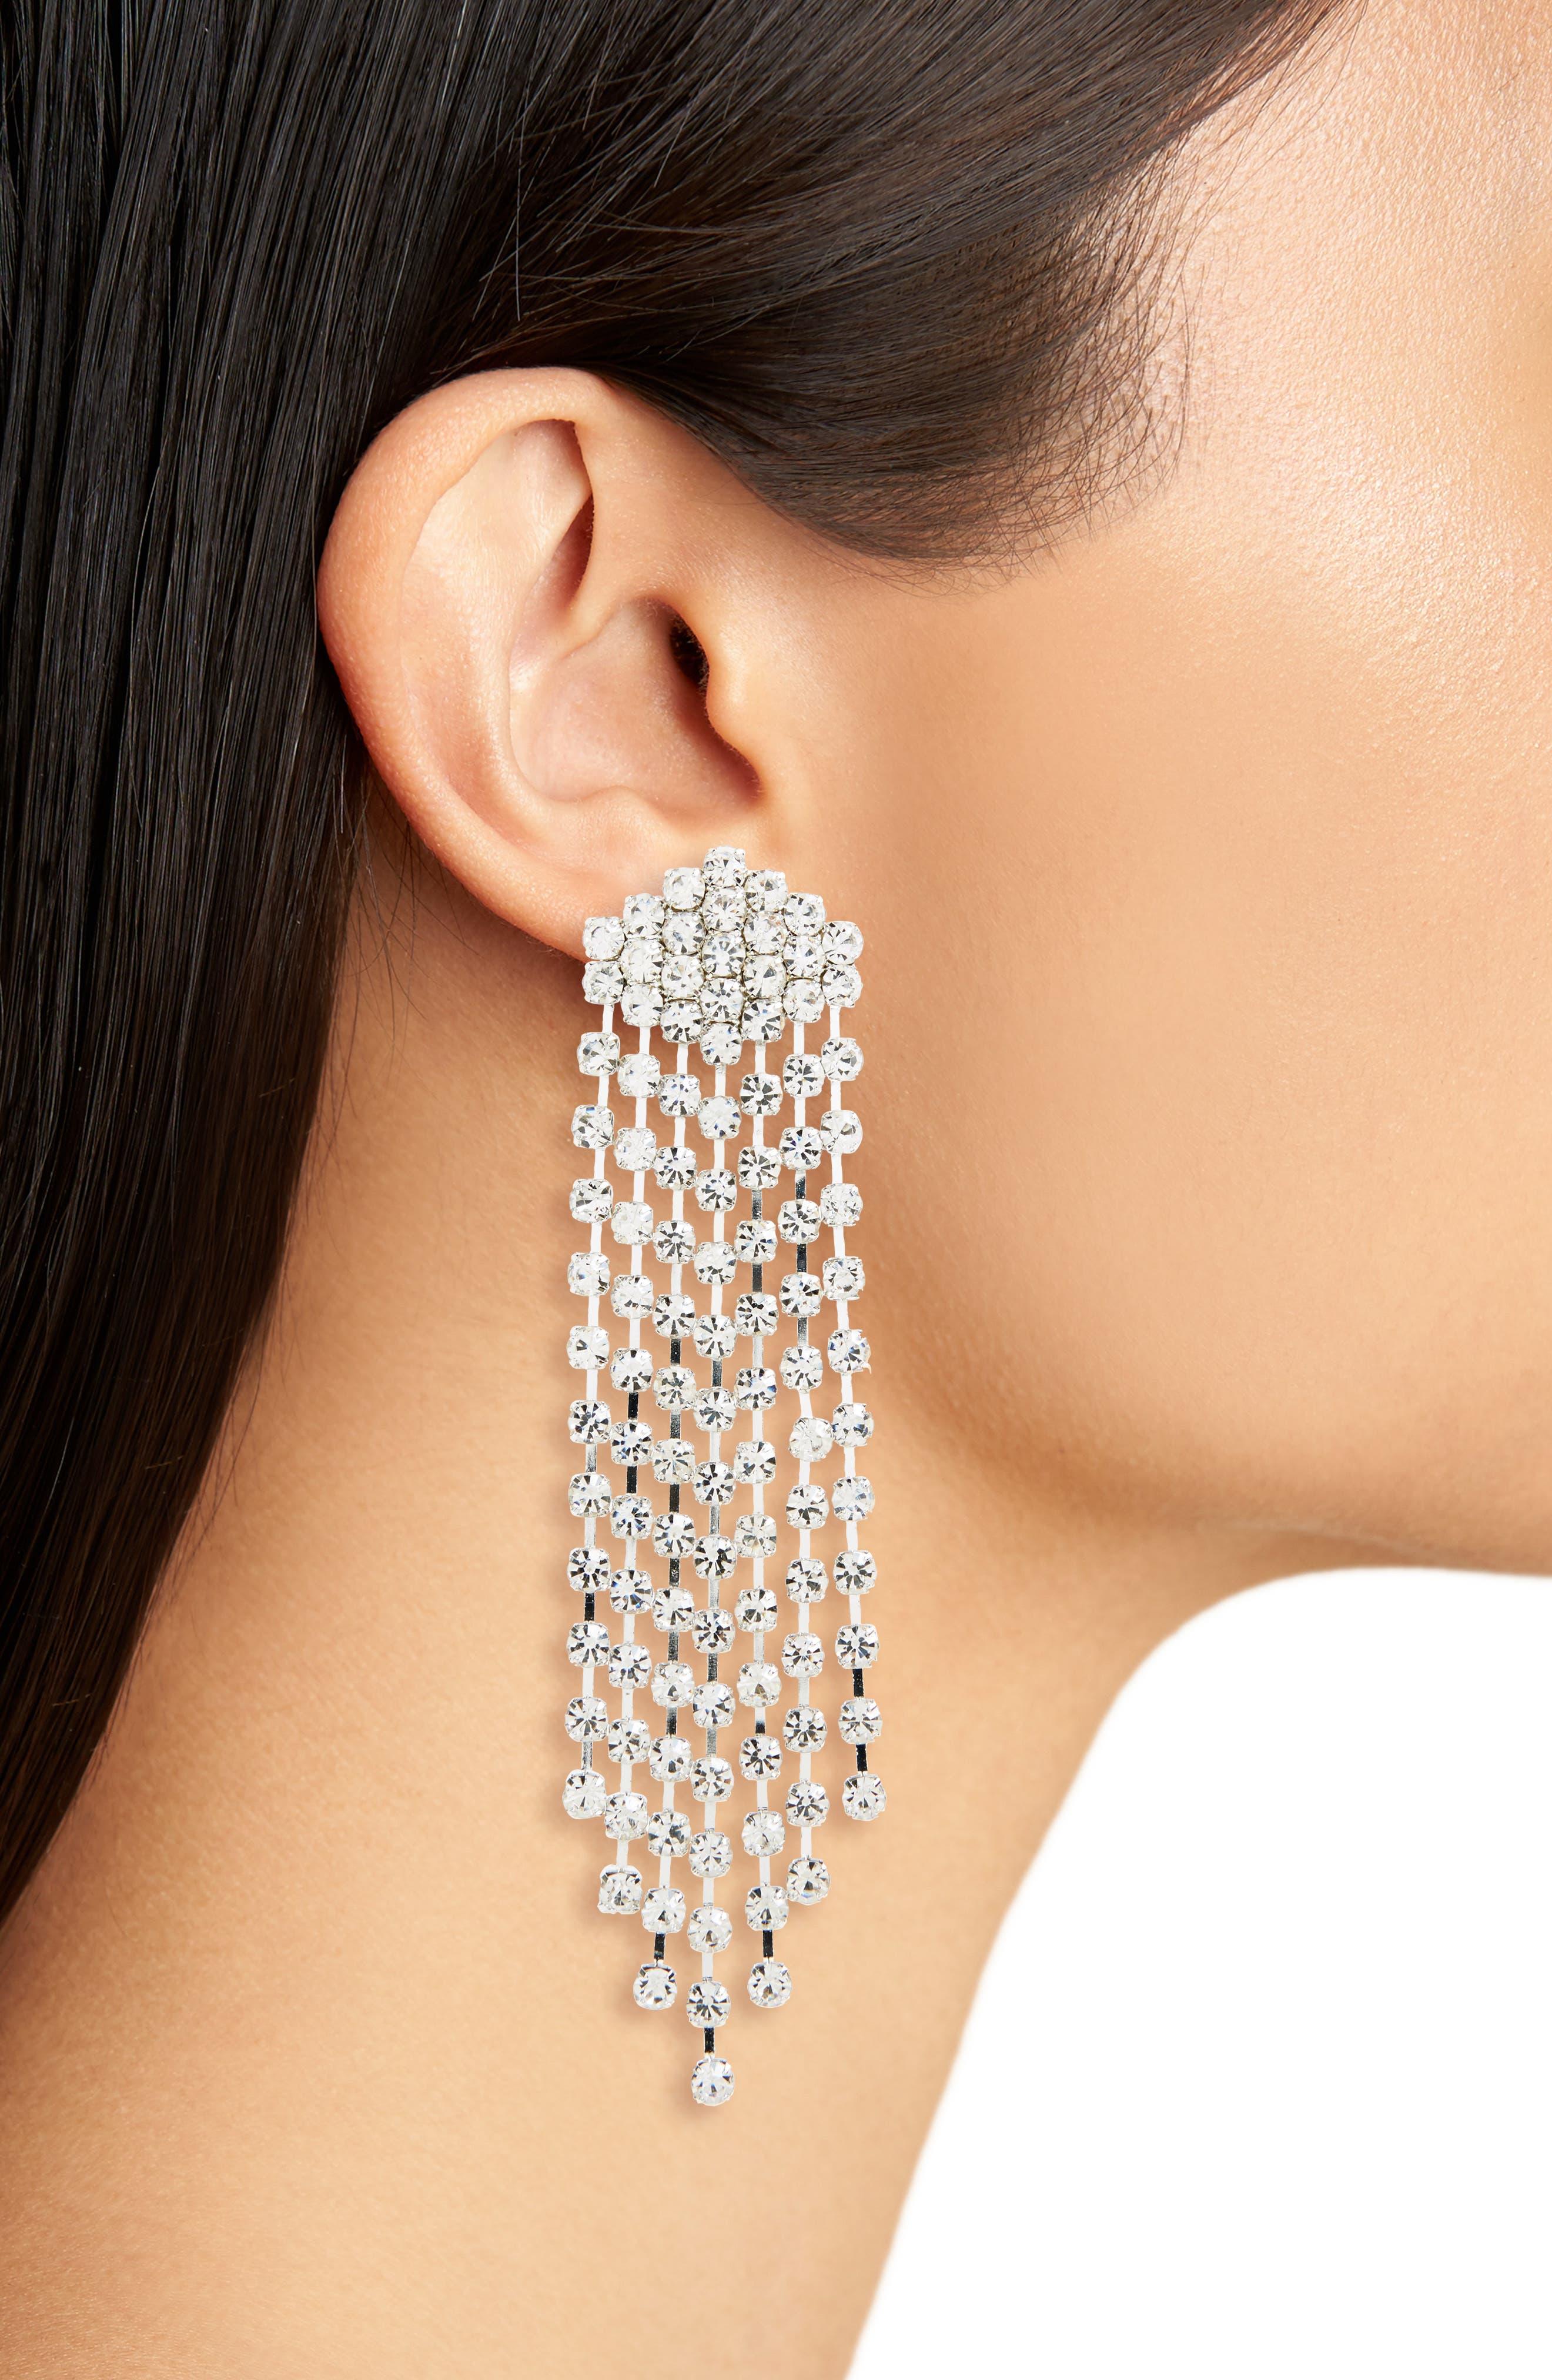 Crystal Chandelier Earrings,                             Alternate thumbnail 2, color,                             Silver/ Crystal